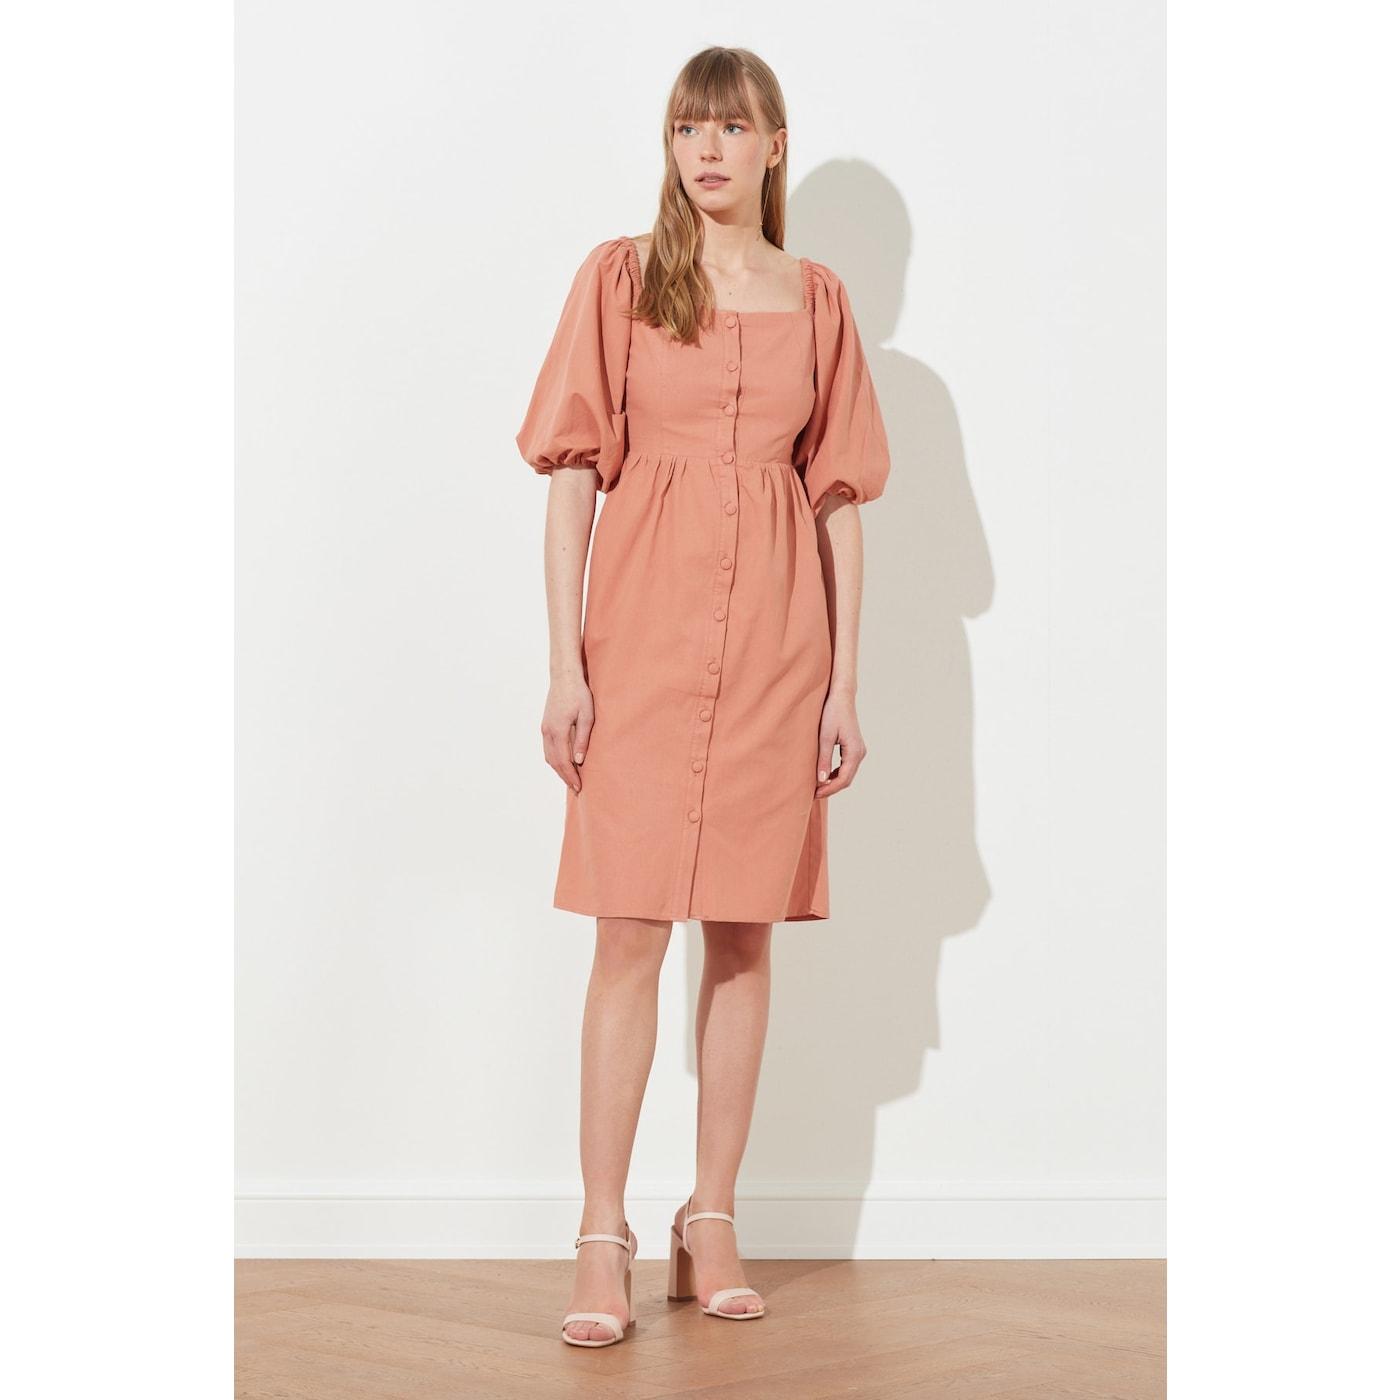 Trendyol Rose Dry Square Collar Buttoned Dress dámské 34